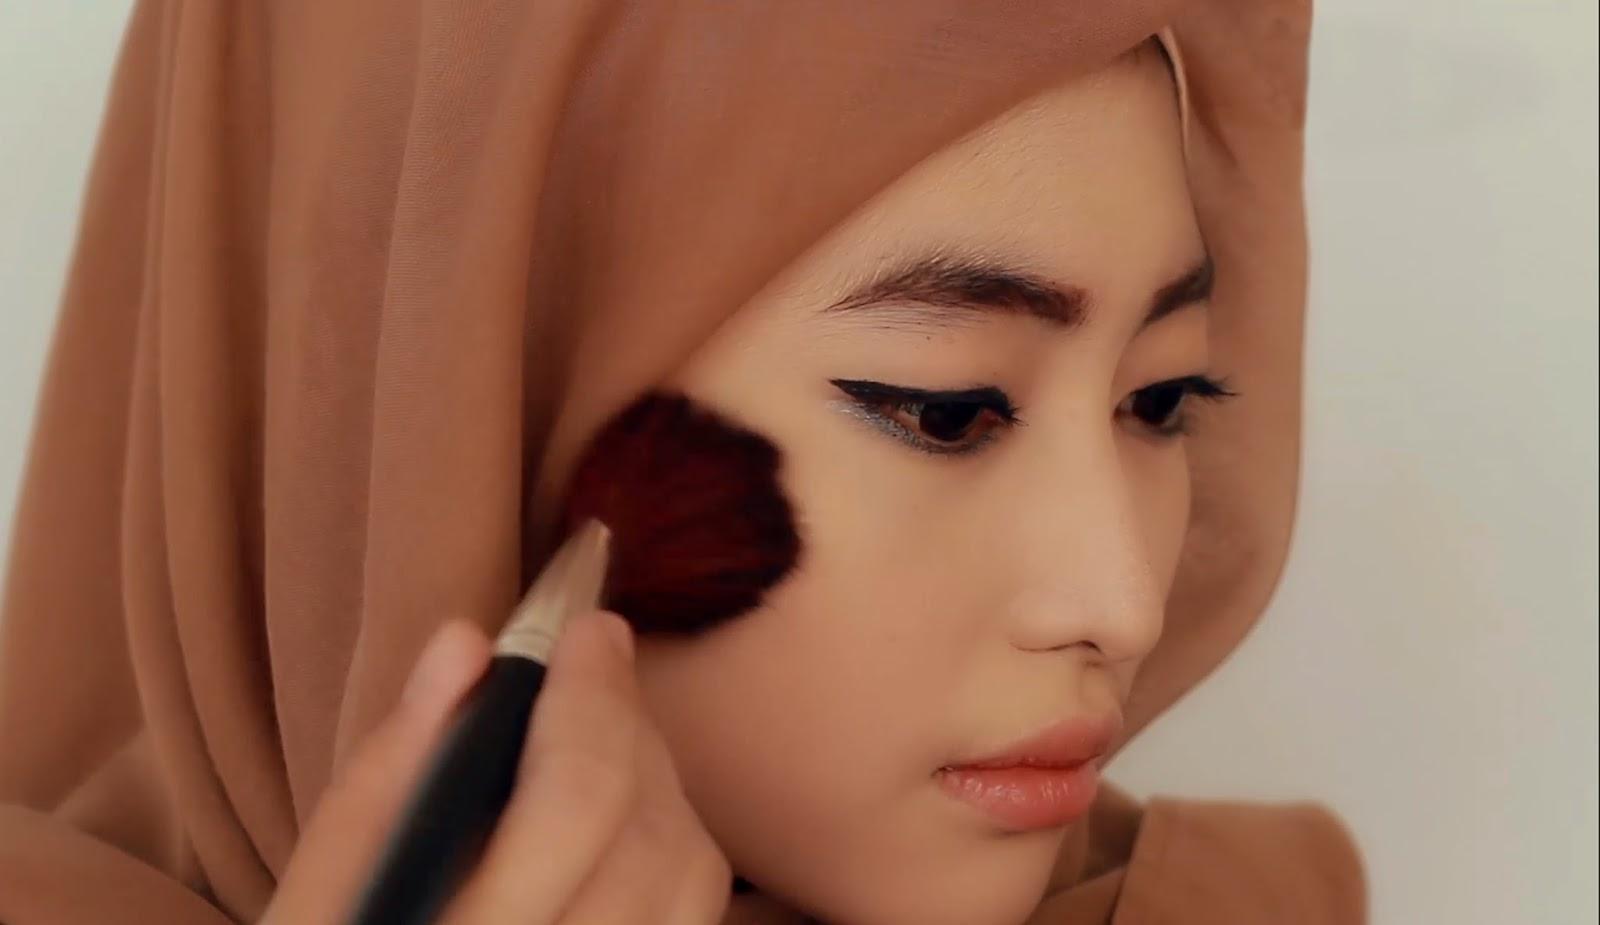 Gunakan Make Up pada Area Pipi